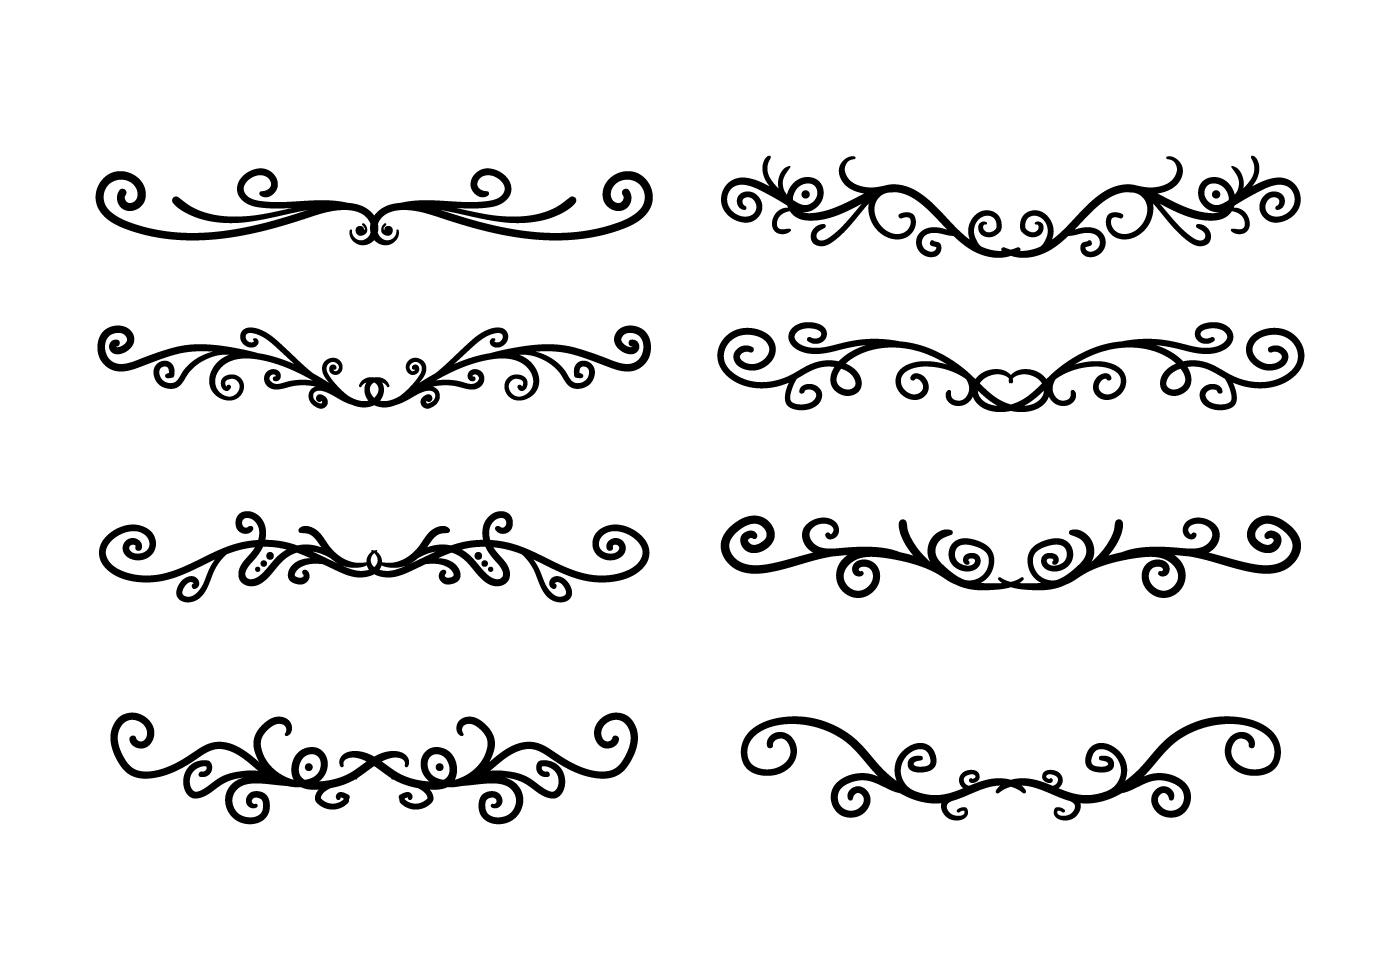 Scroll Work Vector - Download Free Vector Art, Stock ...